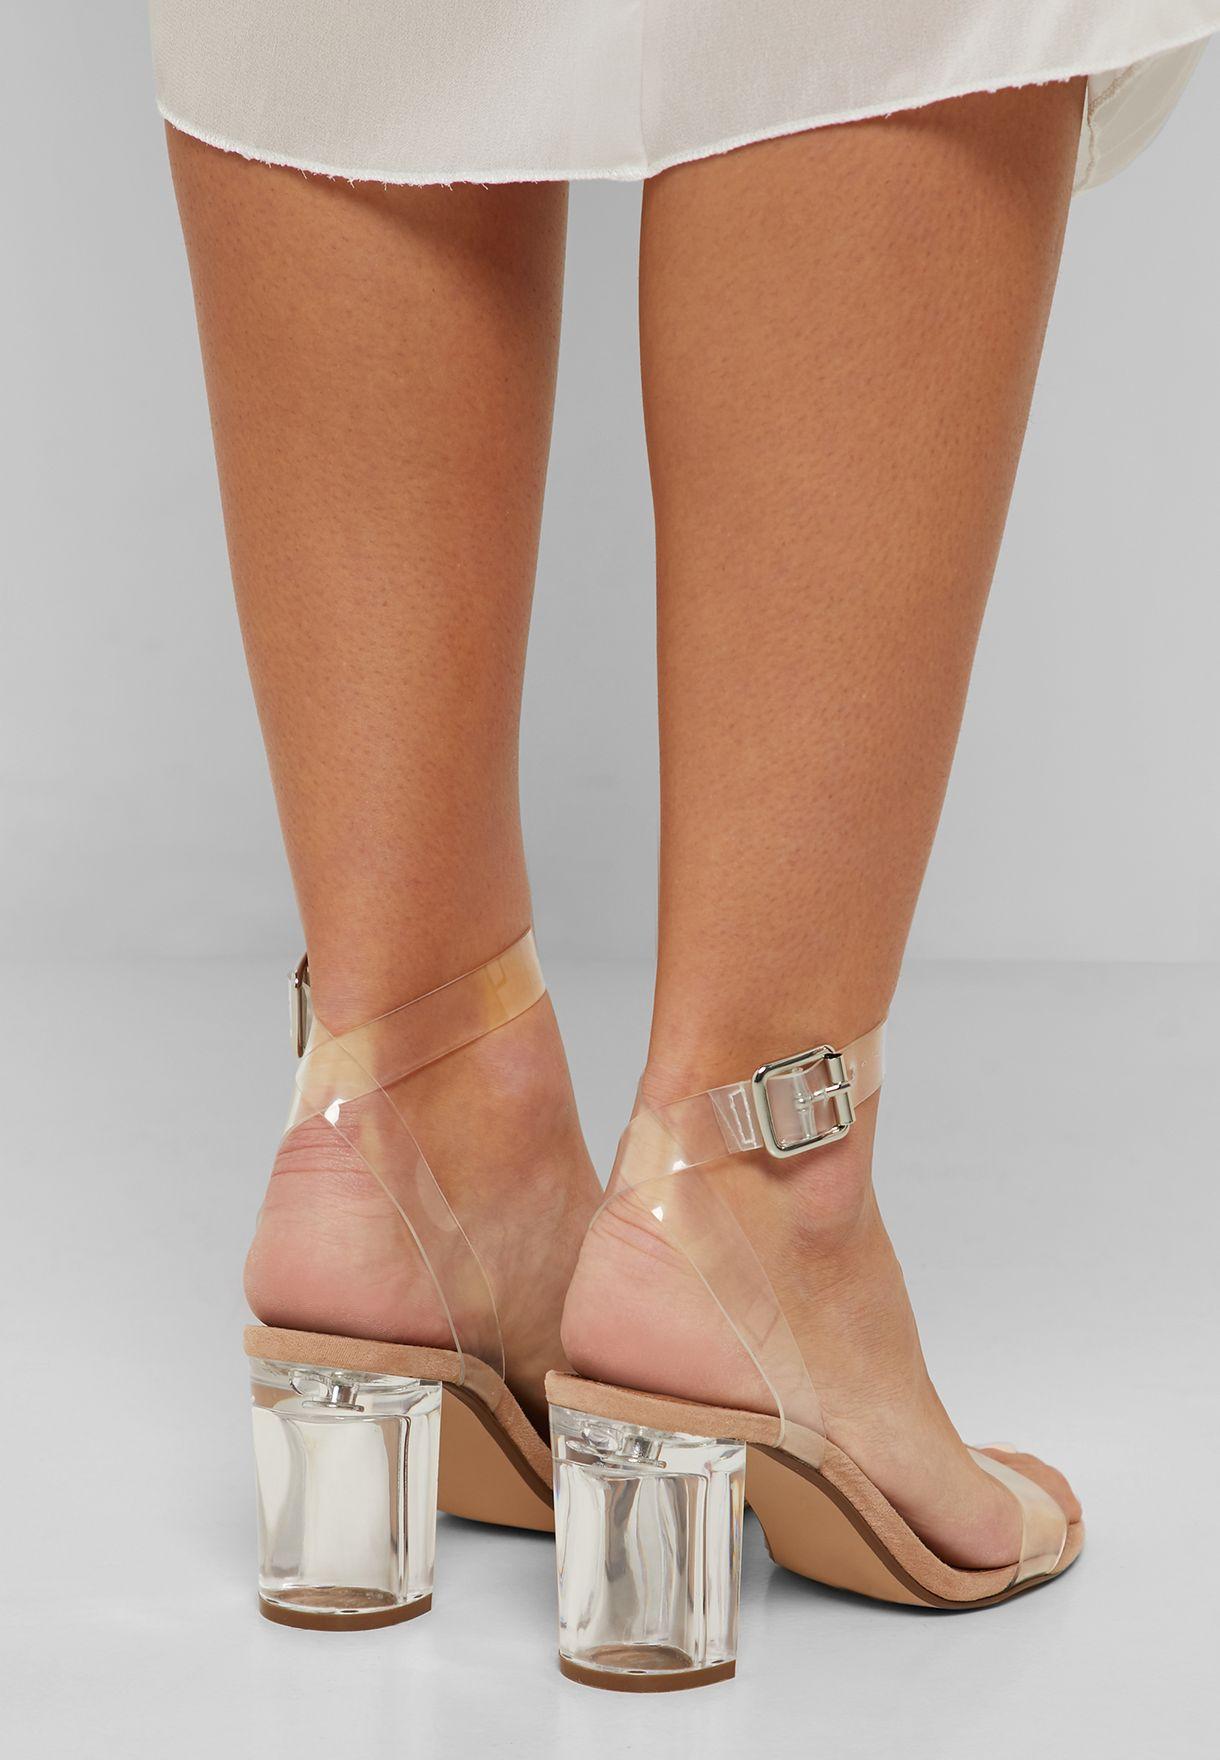 Instruir encanto Publicación  Buy Steve Madden white Mischief Heel Sandal for Women in MENA, Worldwide    MISCHIEF